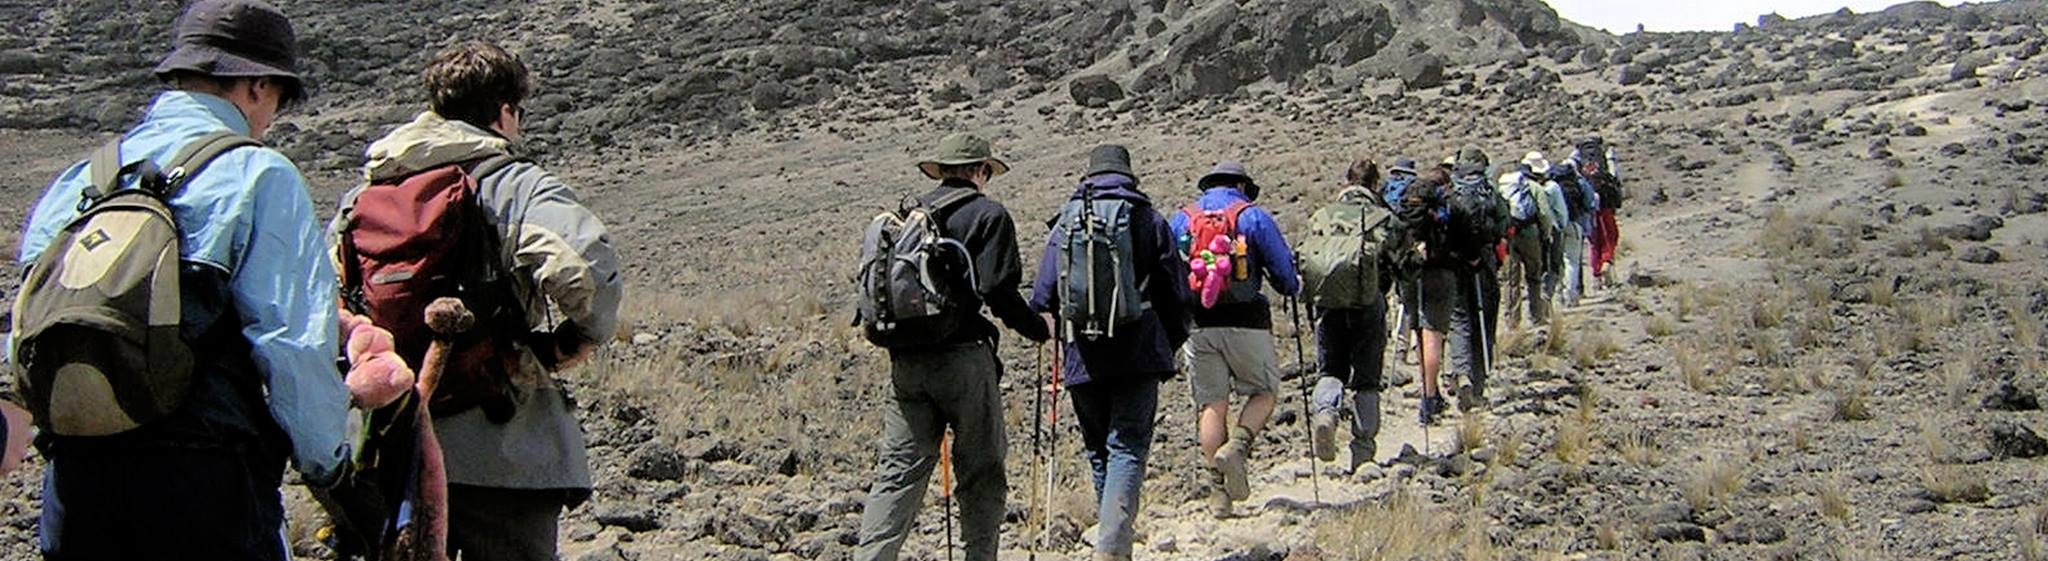 Kilimanjaro + Zanzibar via Machame Route - Safanta Tours & Travel Company Limited